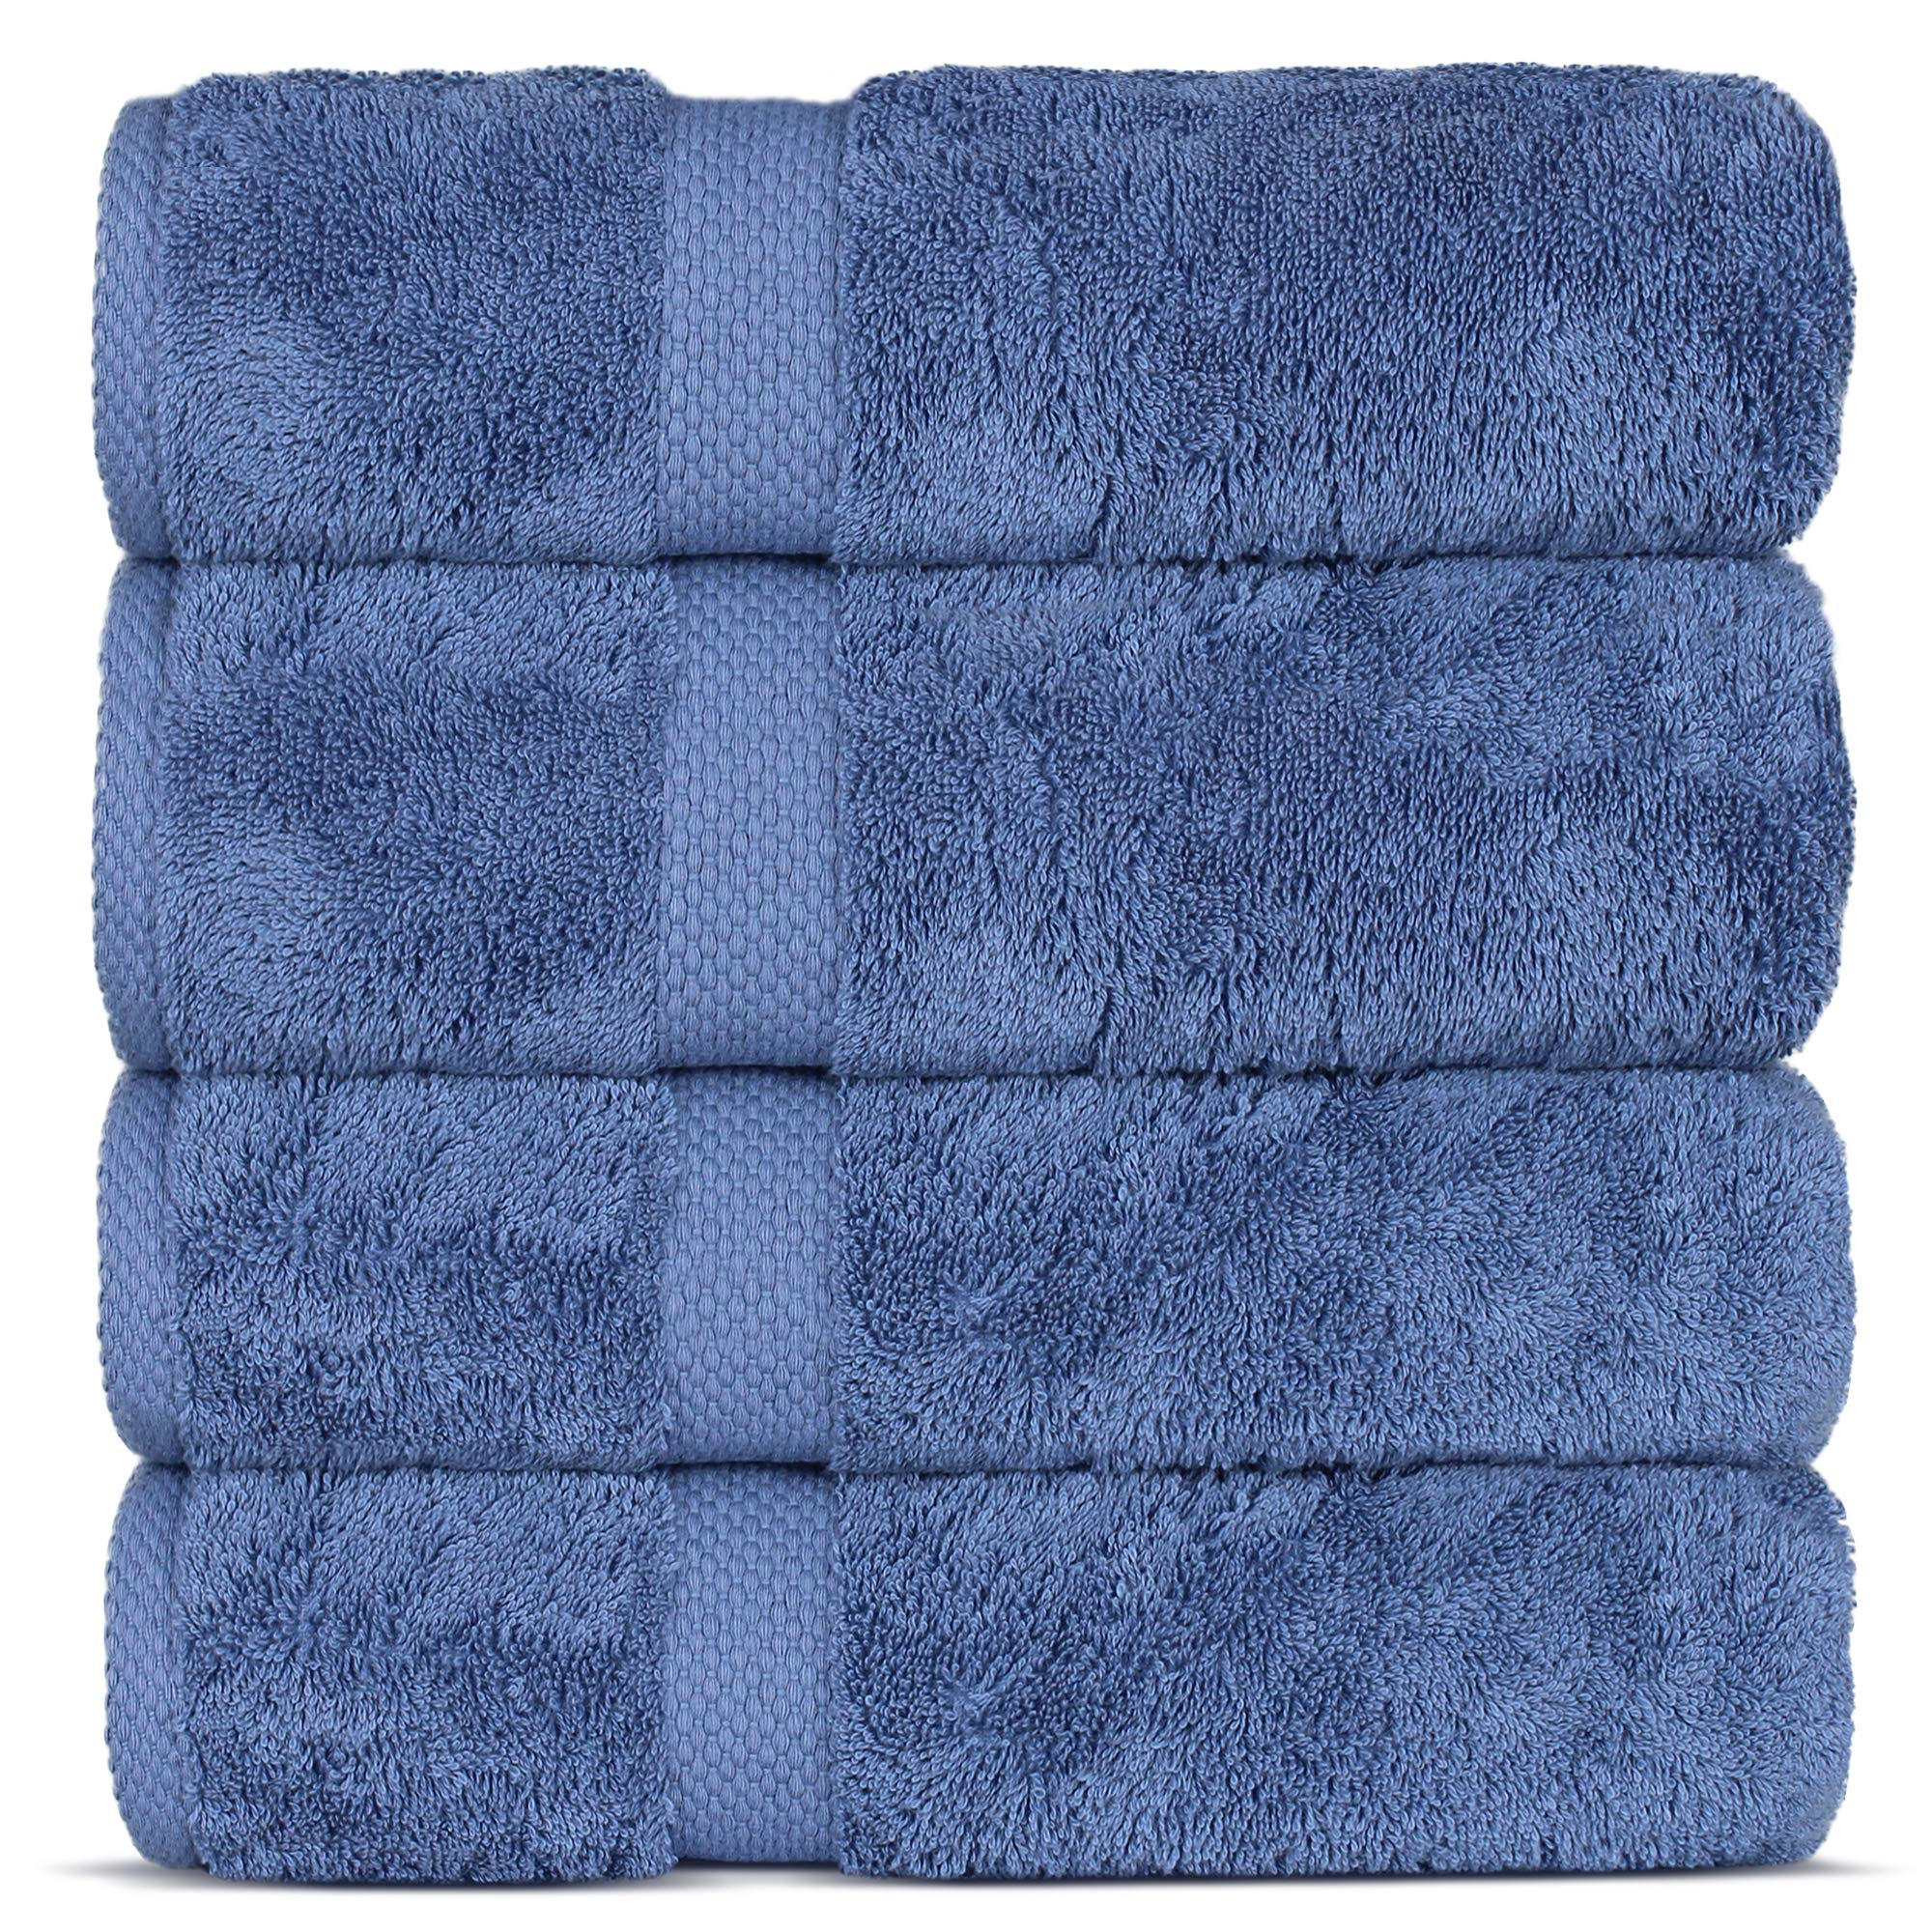 Indulge Linen Premium Turkish Cotton Bath Towels, Soft and Eco-Friendly, Set of 4 (Cornflower Blue)